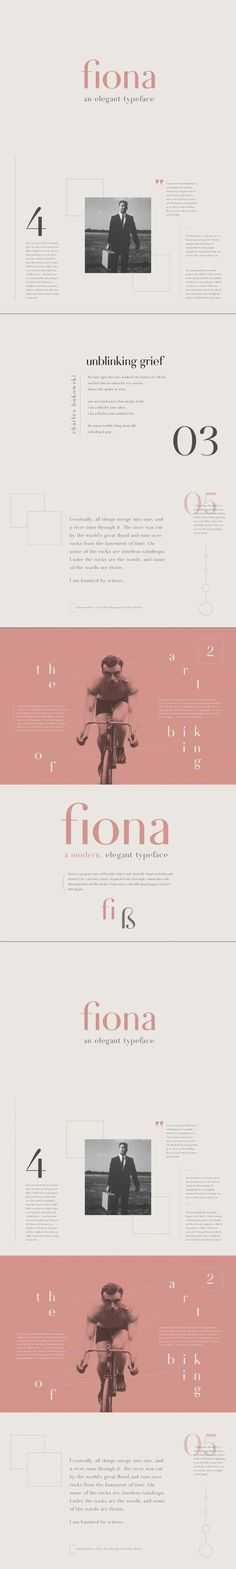 Fiona - An Elegant Typeface #font #WebFont #font #typography #ModernFont #rustic #rustic #truetype #wedding #website #wedding #sansserif #typeface #HandwritingFont #otf #rustic #ElegantFont #elegant #truetypefont